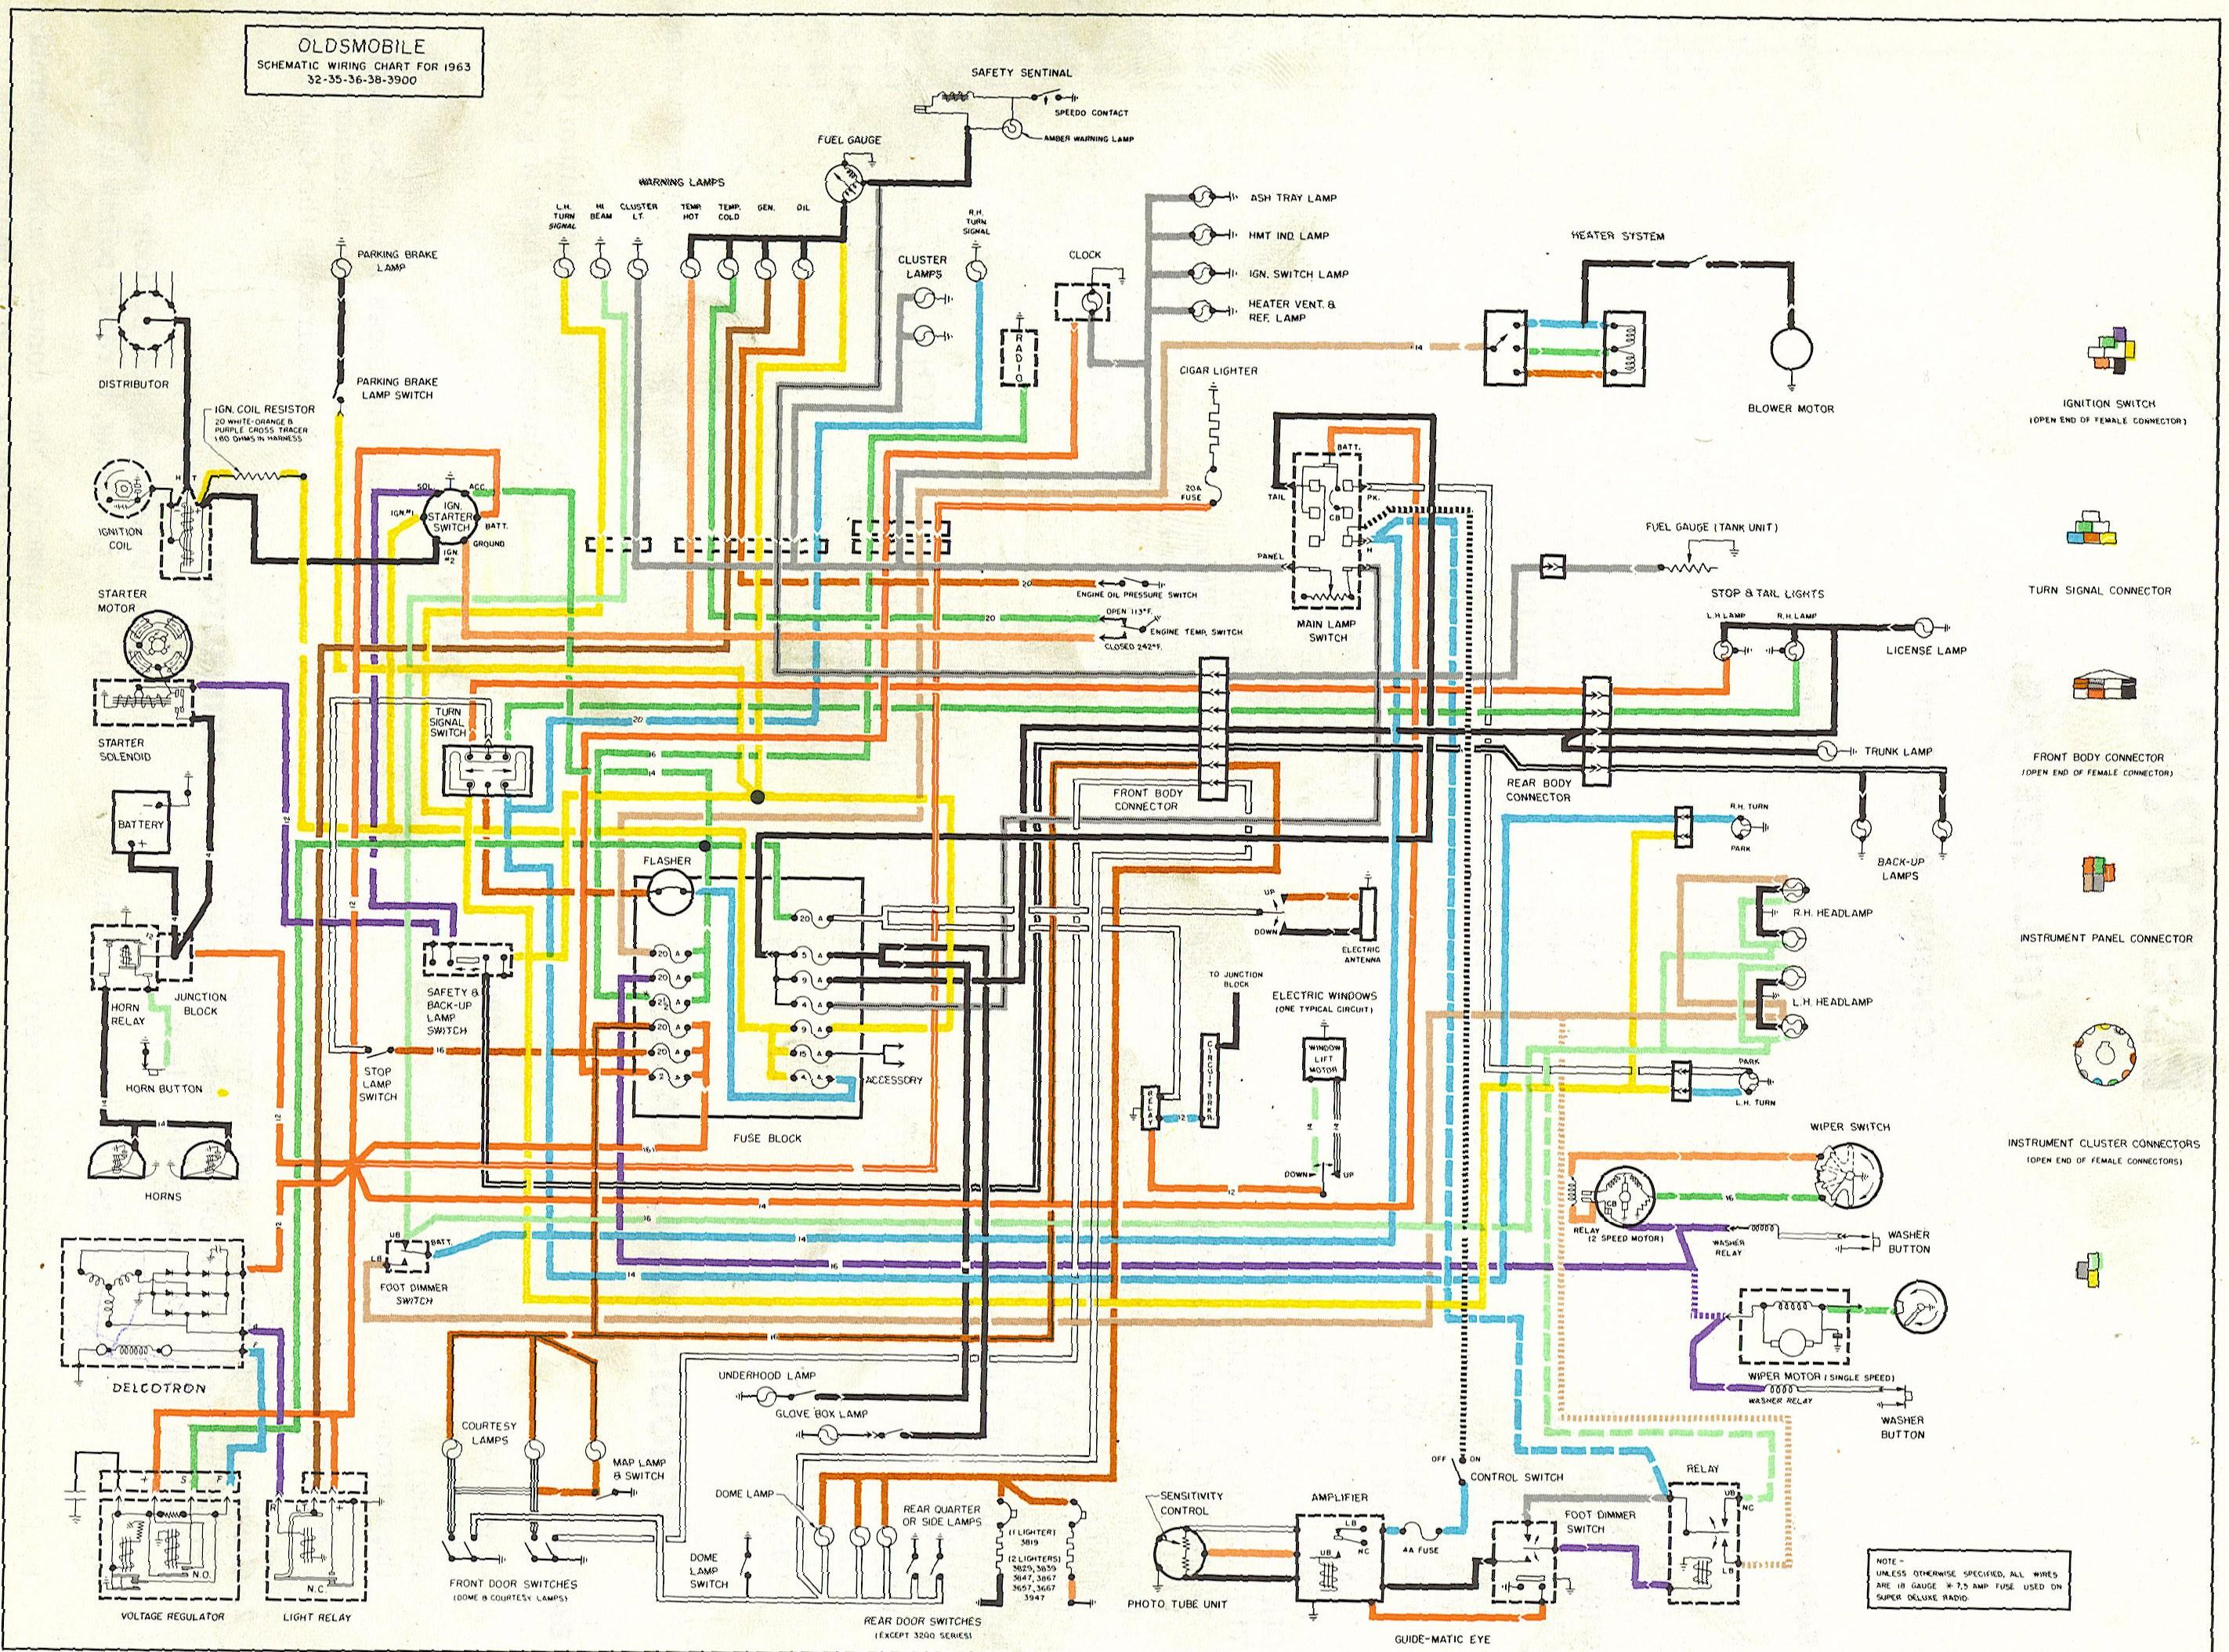 2002 oldsmobile intrigue wiring diagram